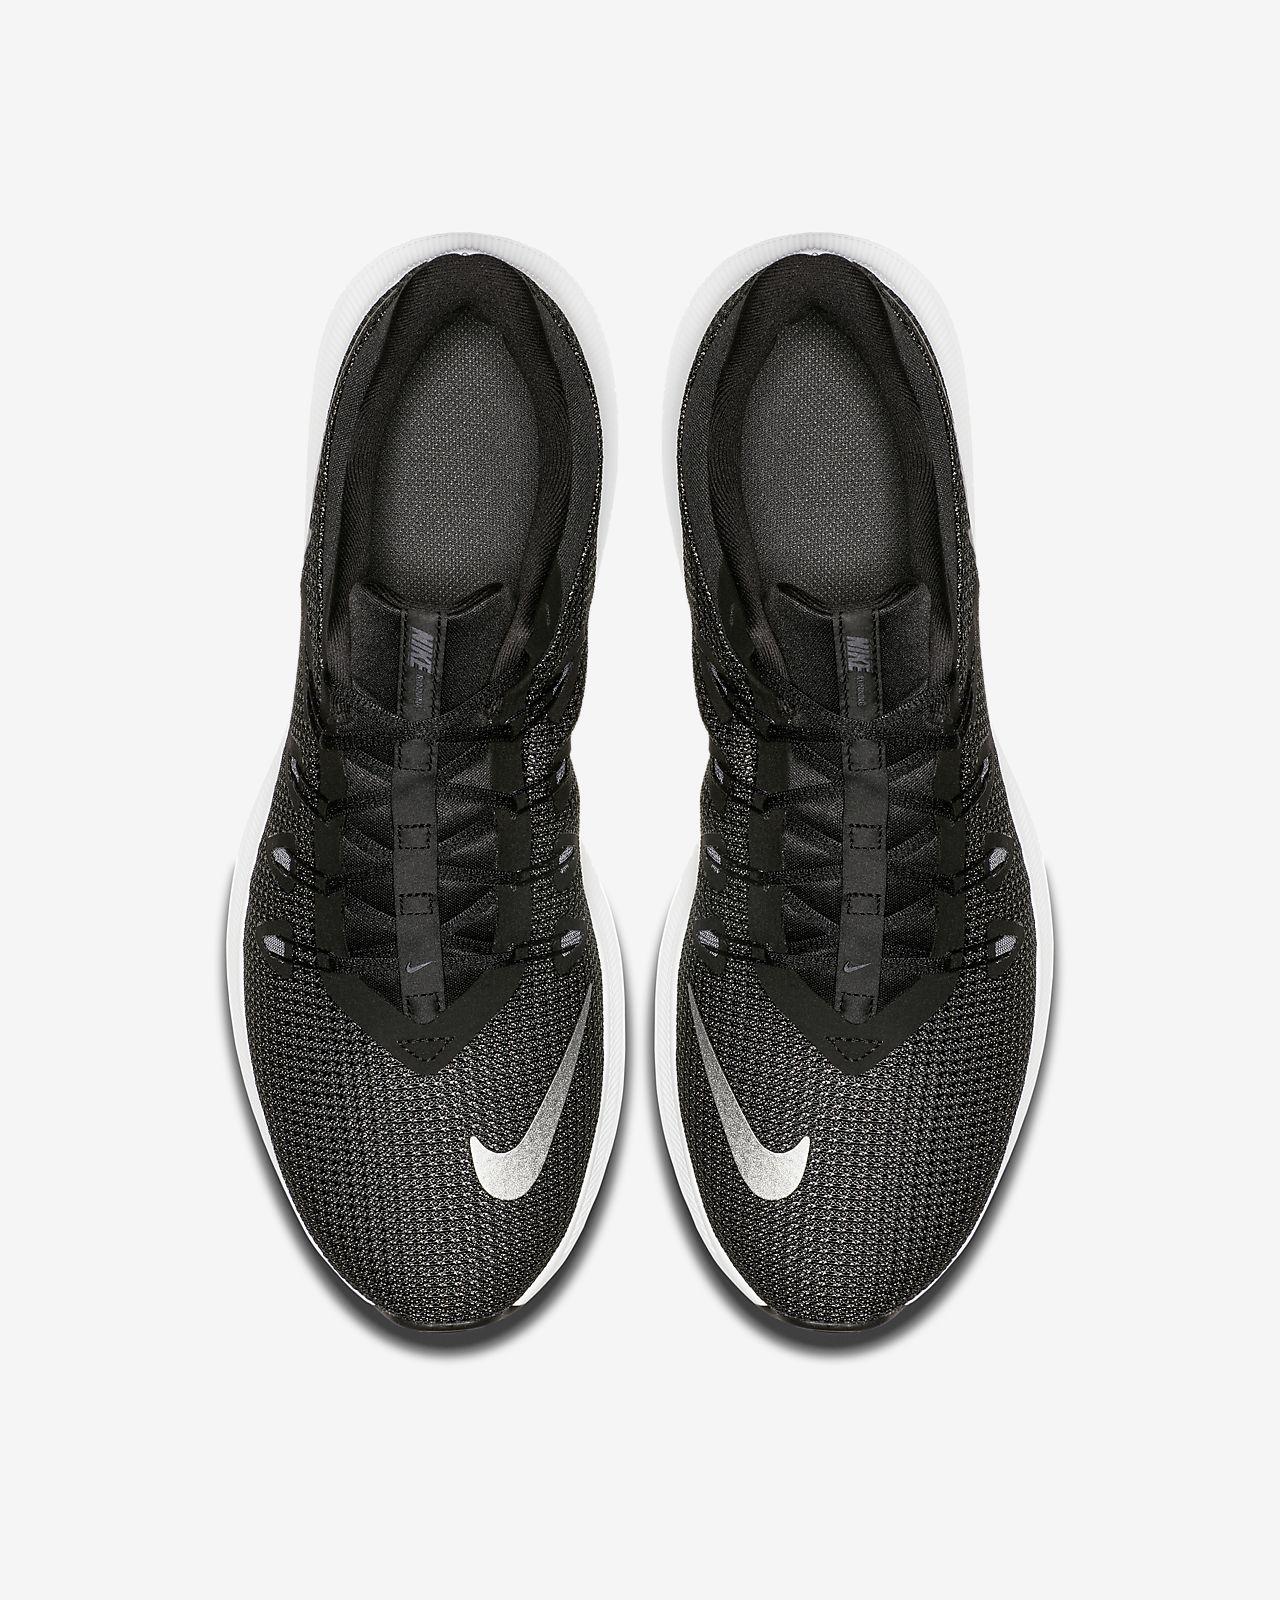 6e0692b1c3f Ανδρικό παπούτσι για τρέξιμο Nike Quest. Nike.com GR